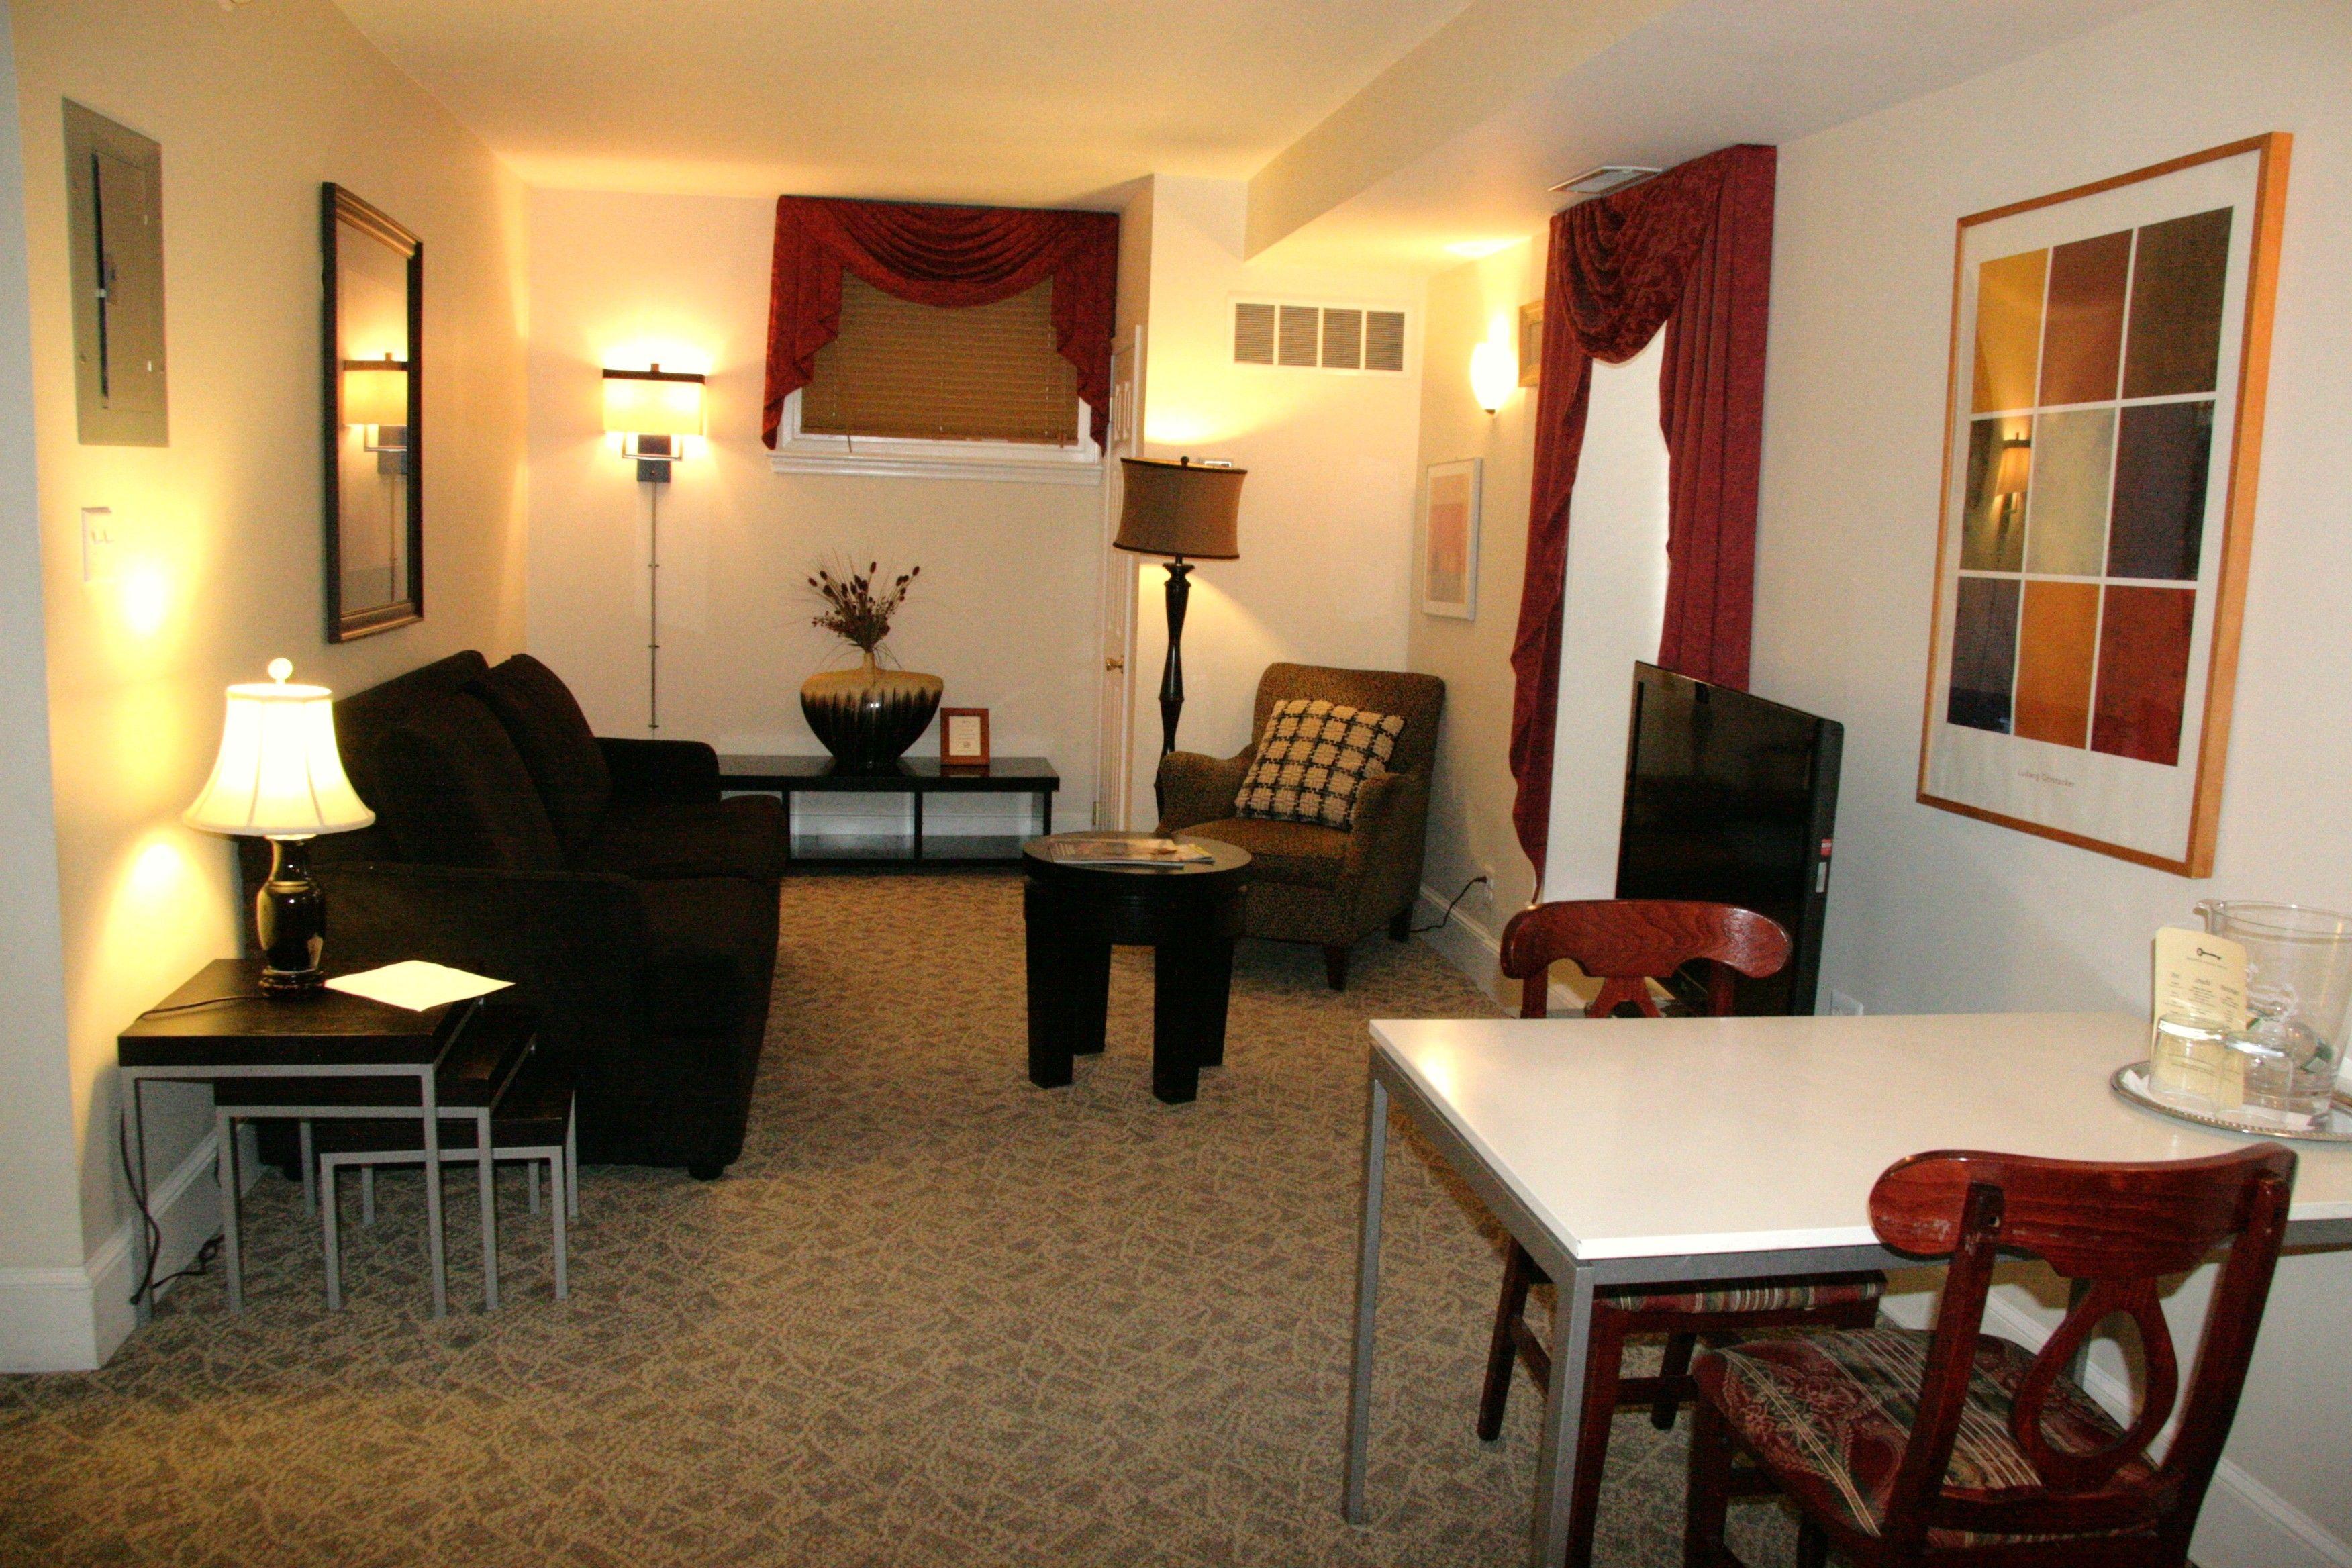 Living Room (Room 101)